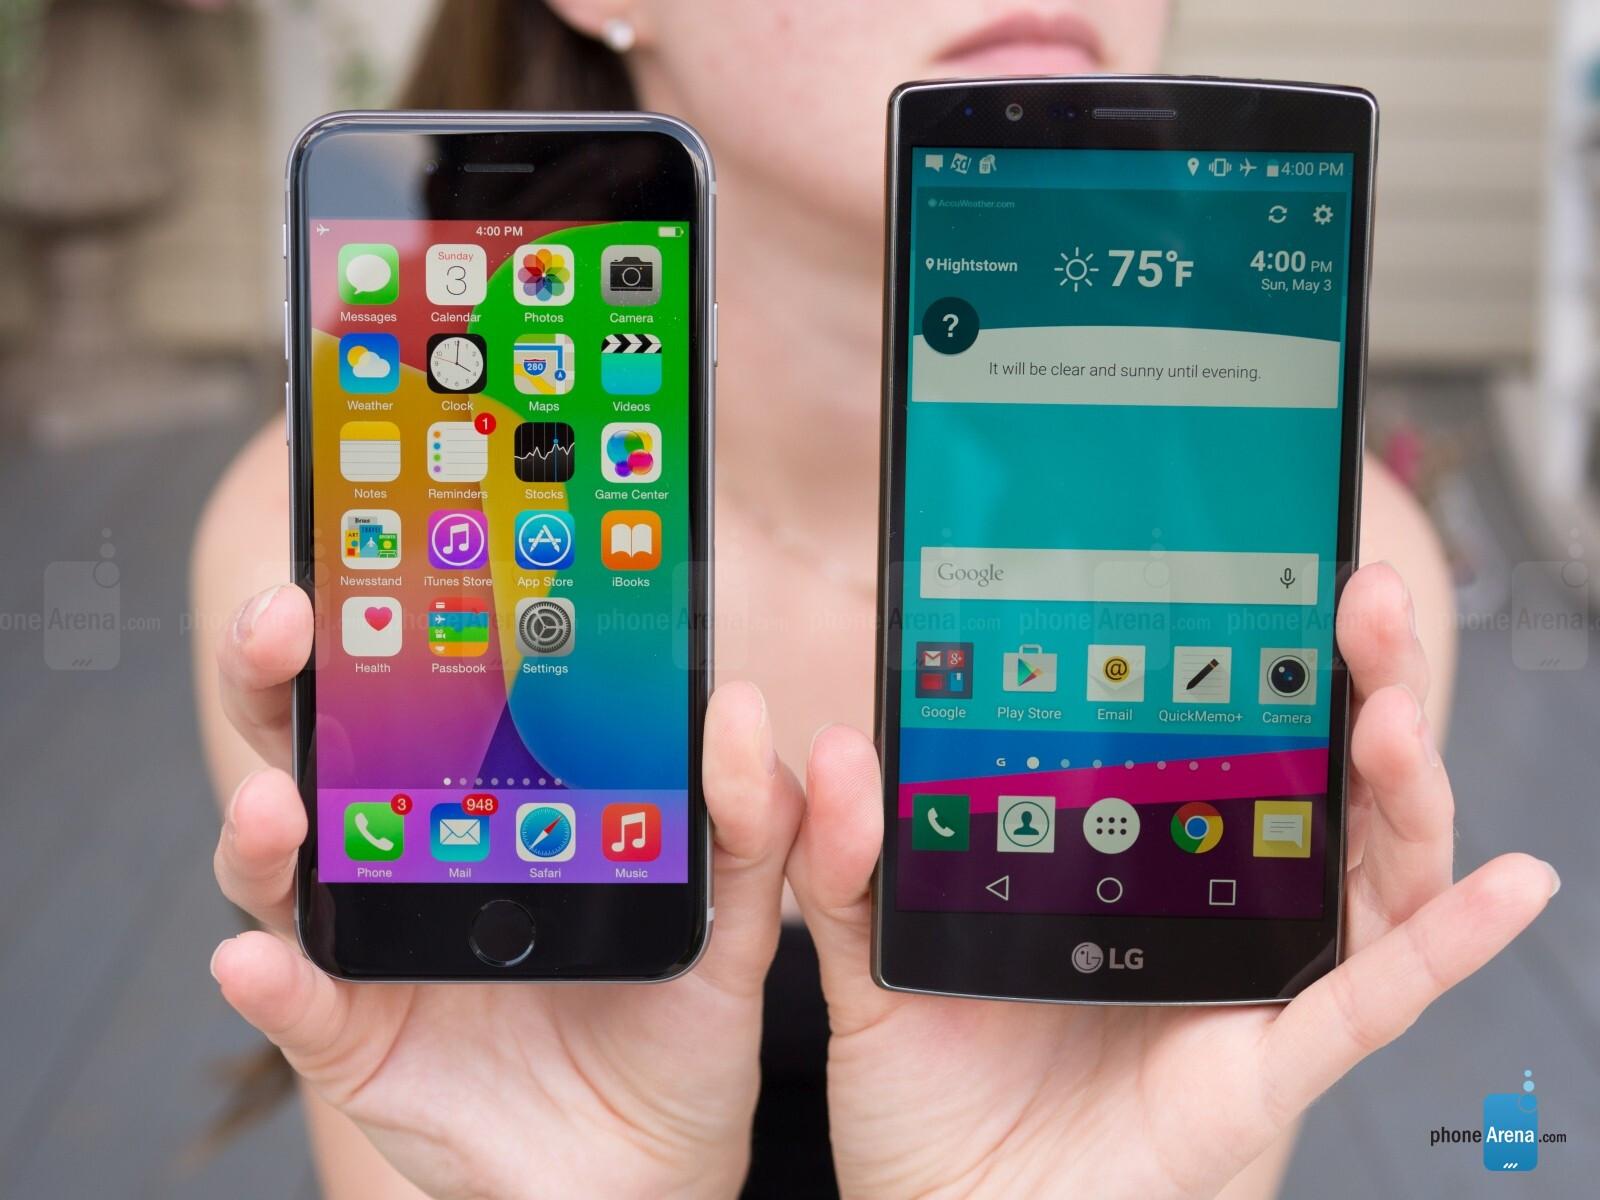 lg g4 vs apple iphone 6